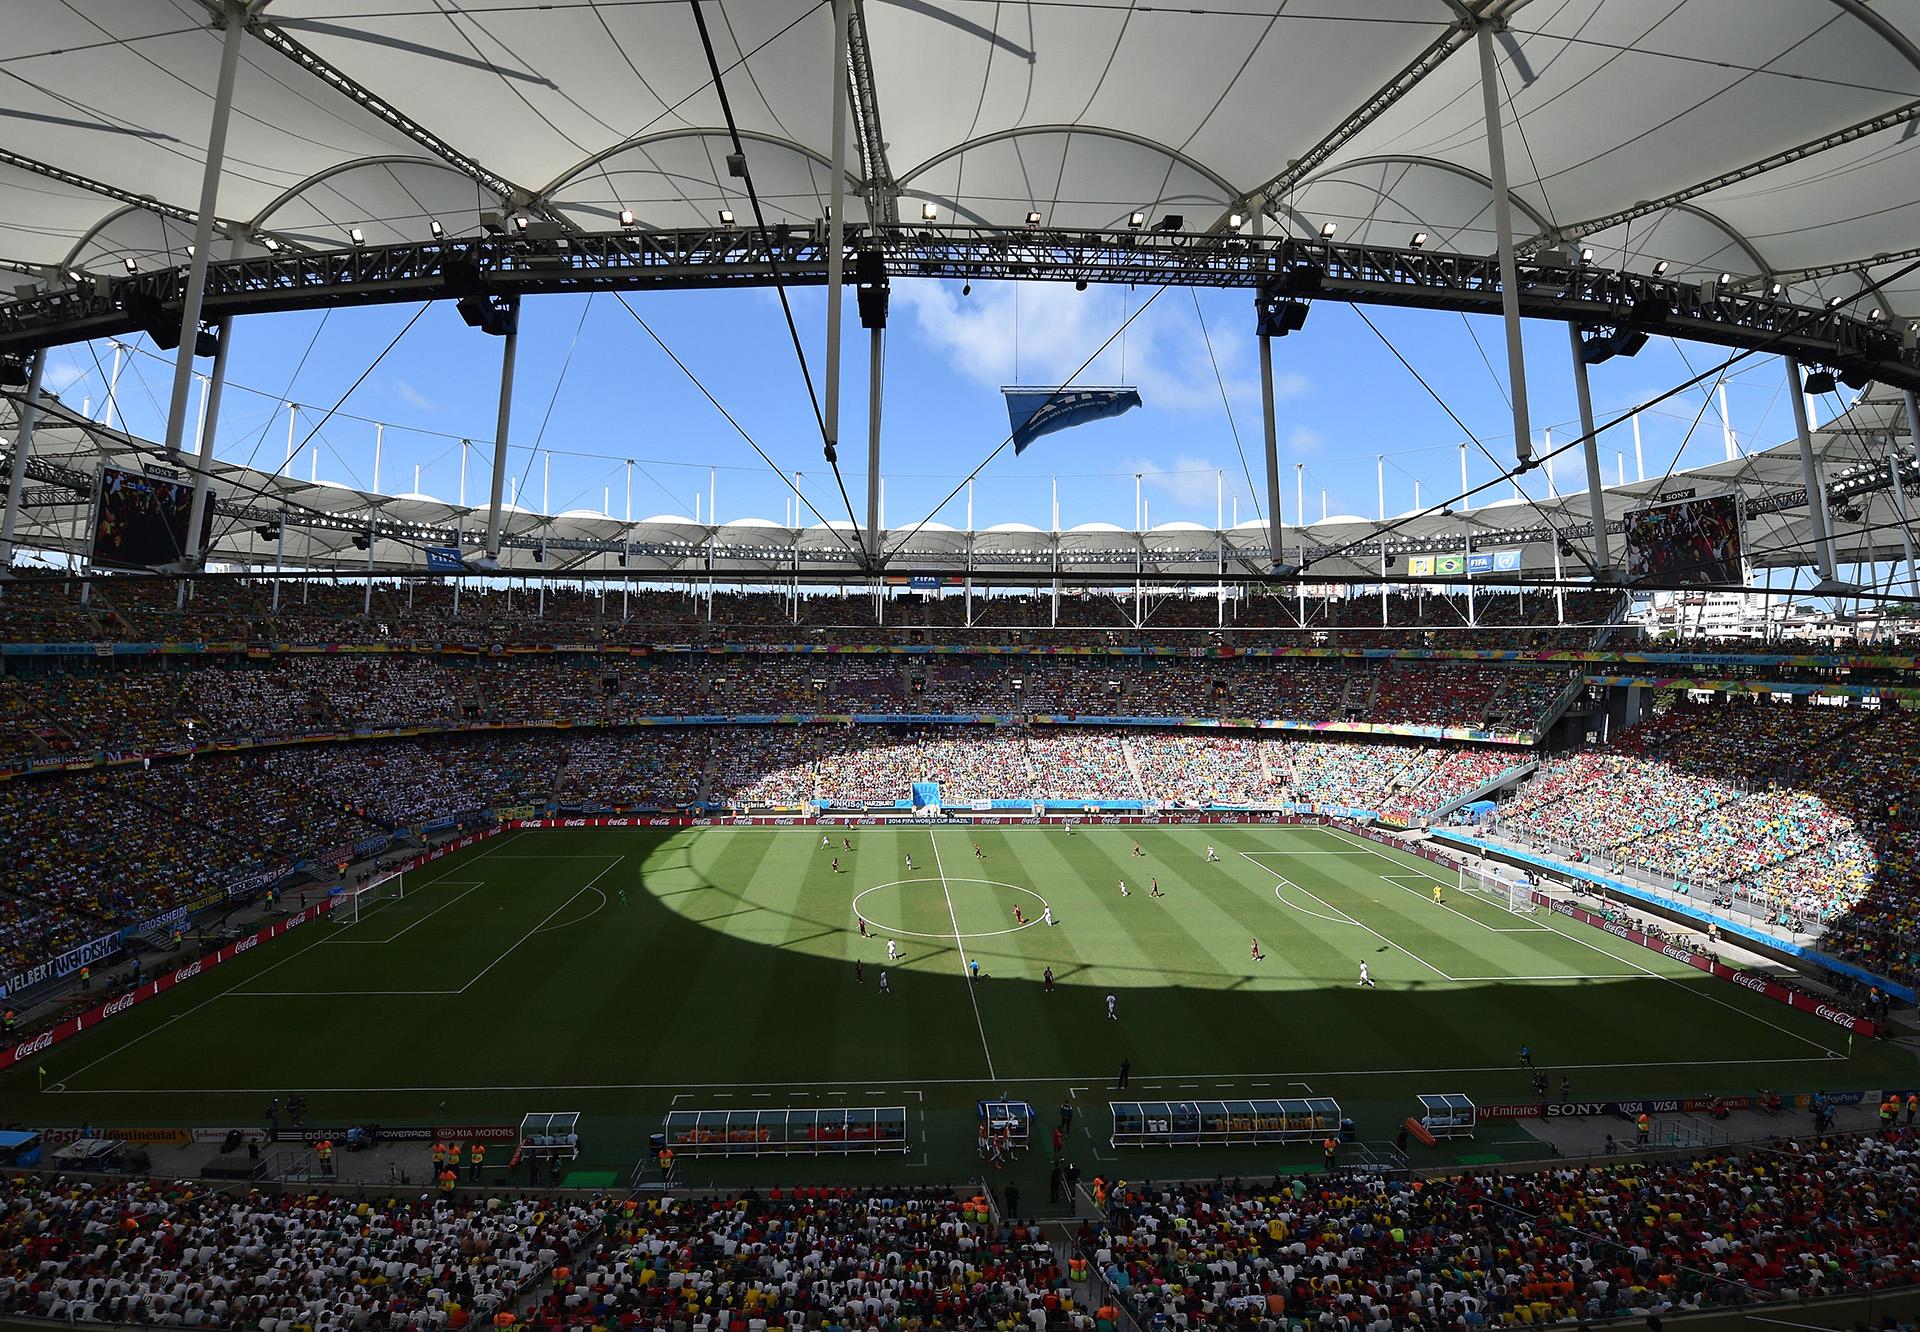 Arena Fonte Nova 2014 World Cup